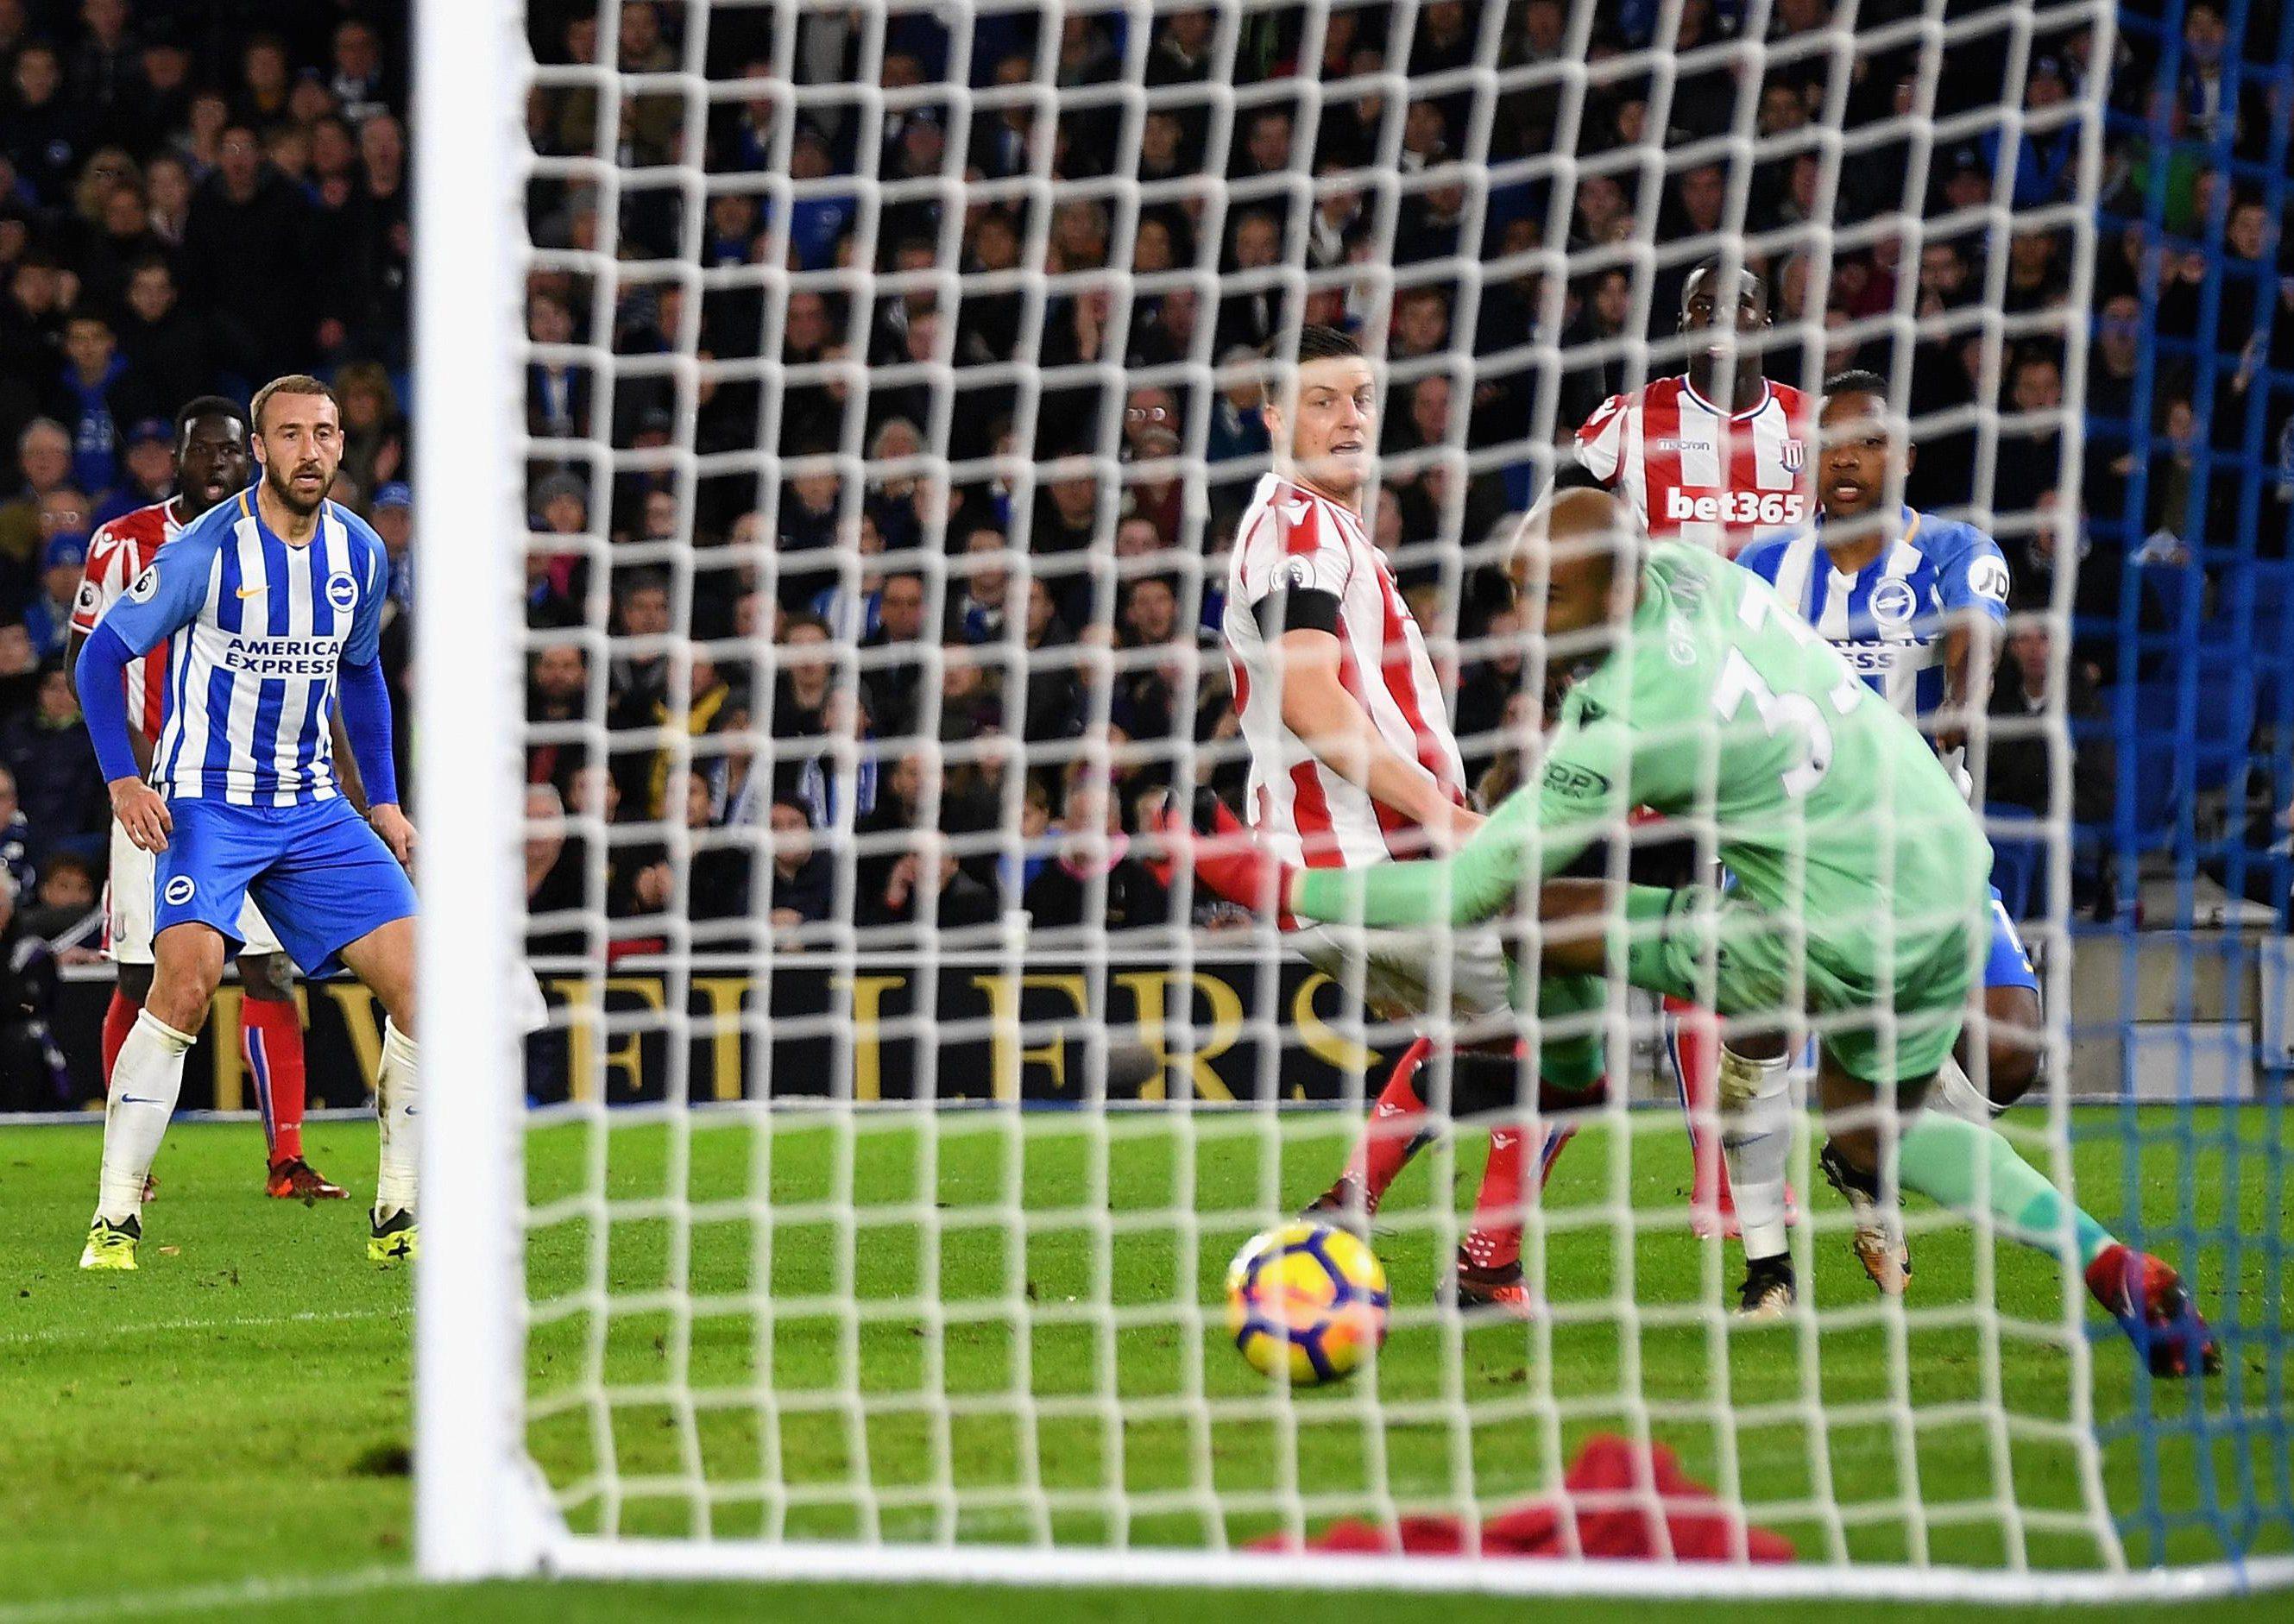 Jose Izquierdo scored a vital equaliser for the home side